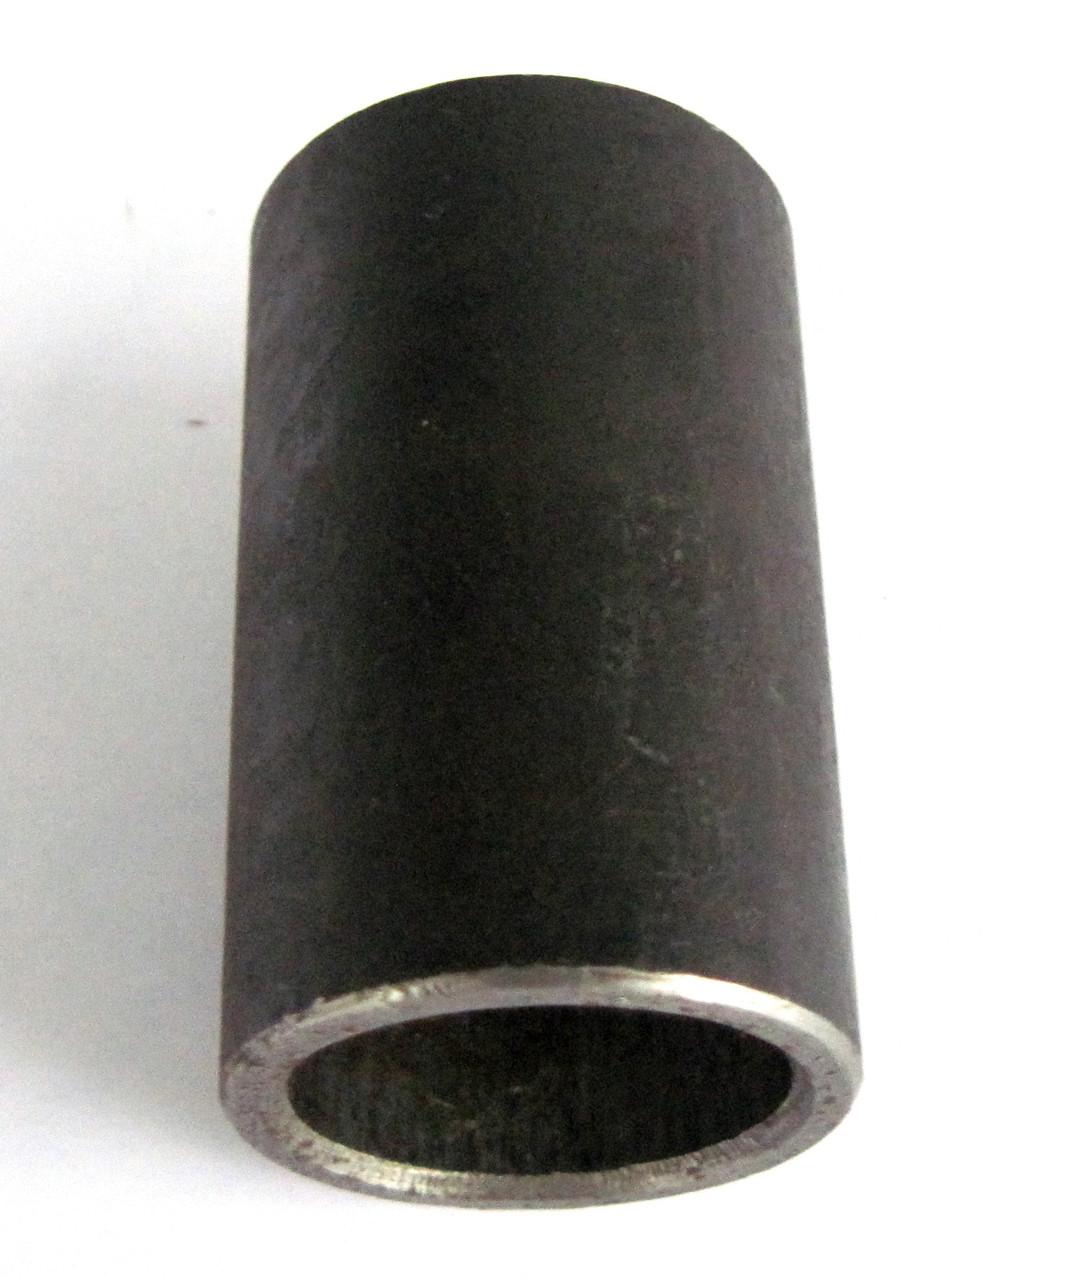 Втулка рычага подвески РСМ-10Б.01.01.802 (Дон, Акрос, Вектор)